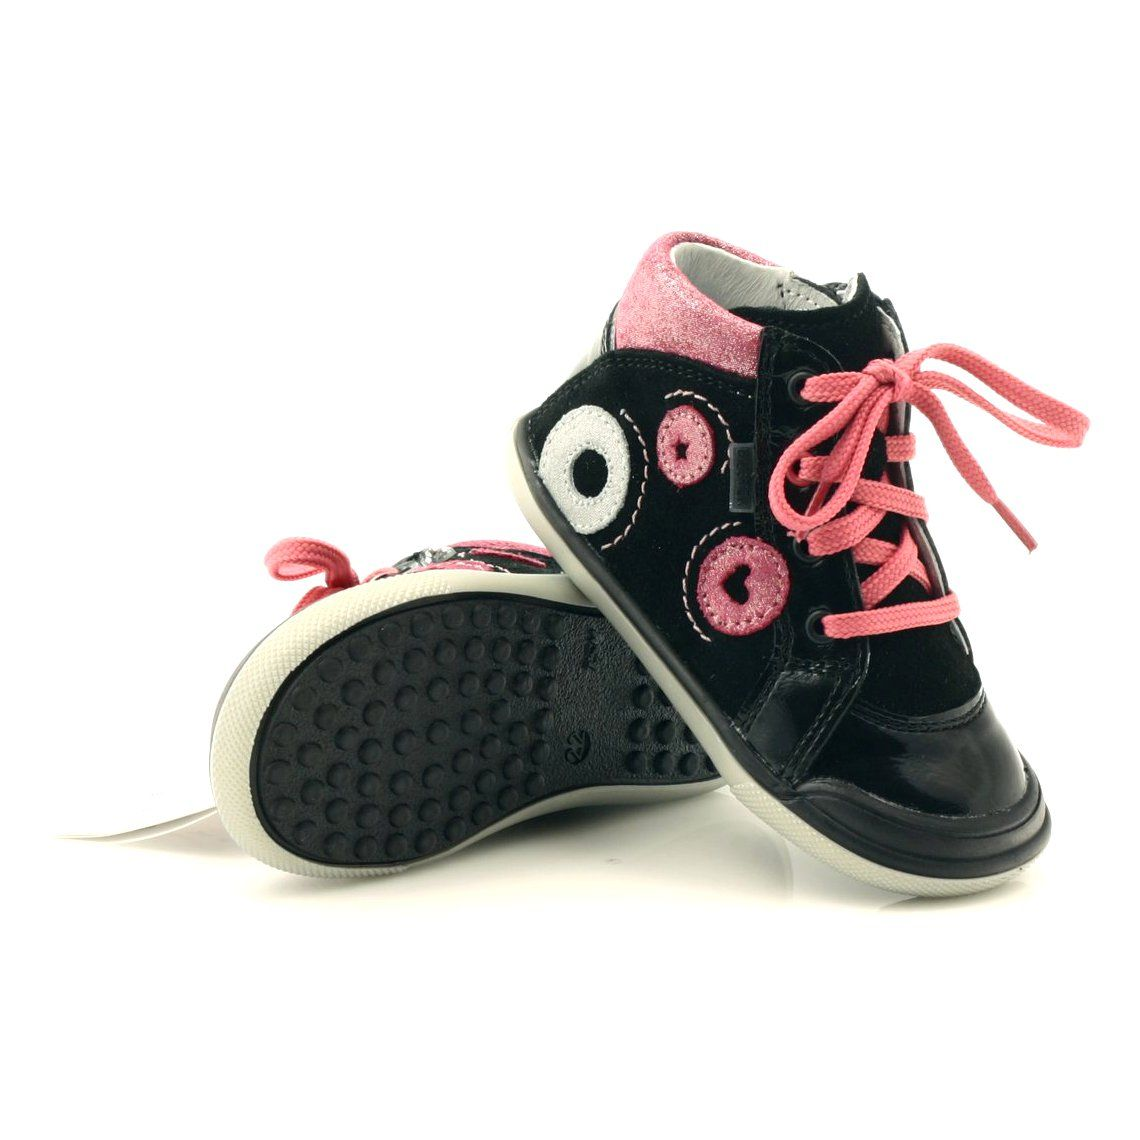 Trzewiki Na Suwak Bartek Czarne Lakier Rozowe Szare Childrens Shoes Baby Shoes Kid Shoes